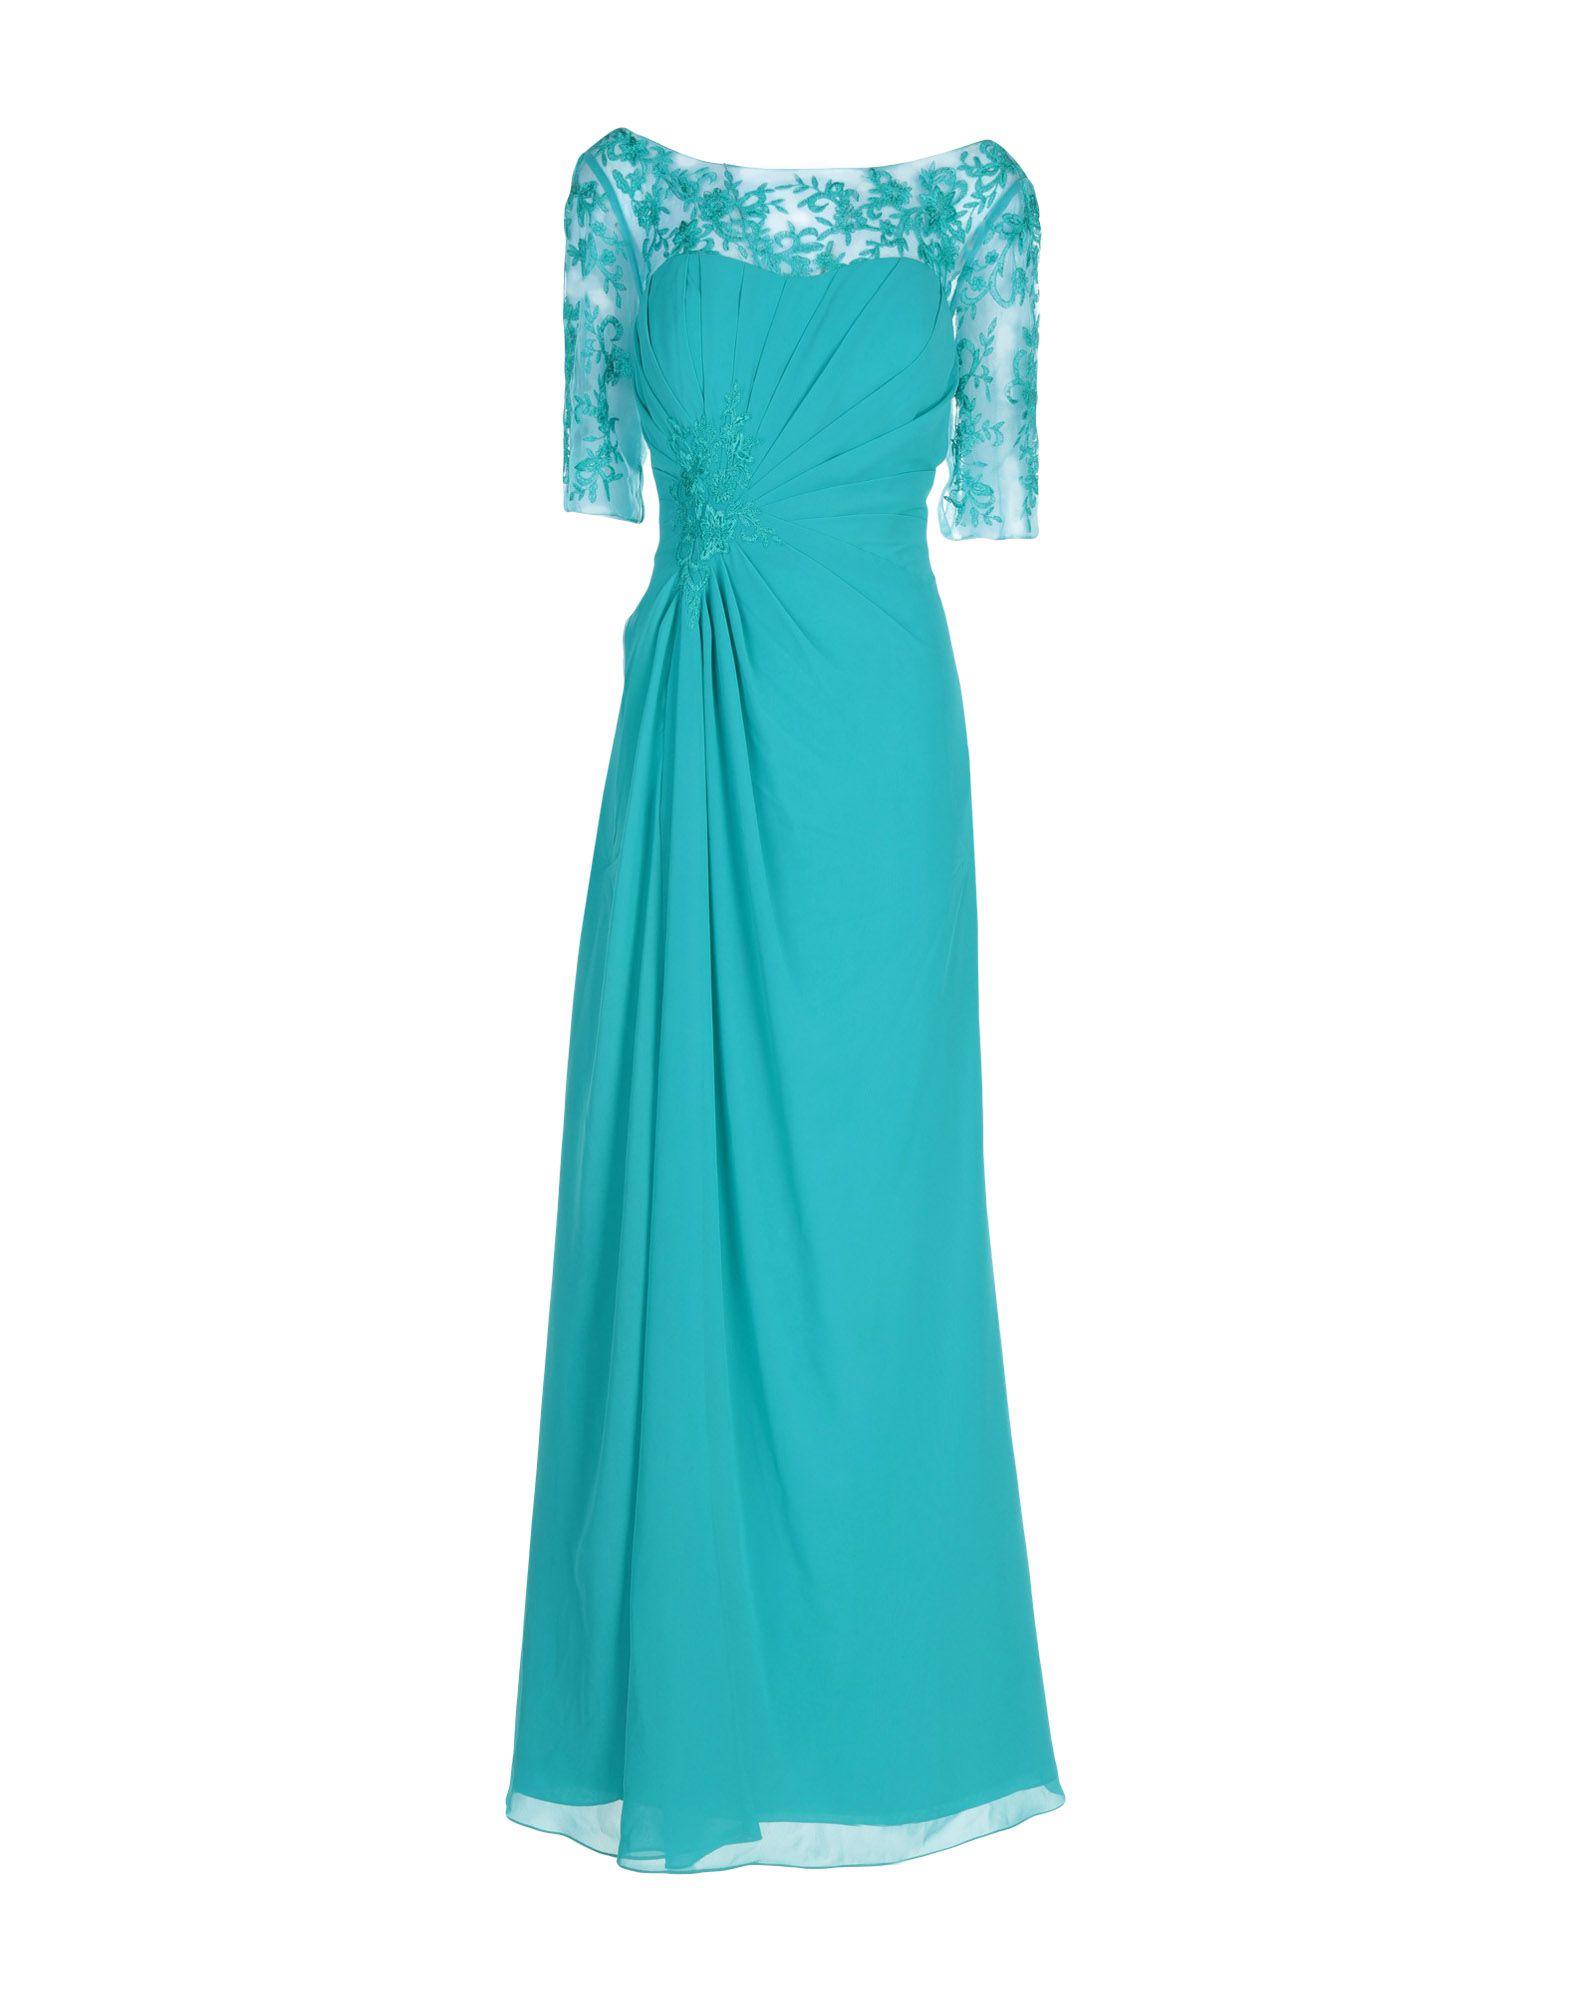 BELLA RHAPSODY by VENUS BRIDAL Длинное платье свадебное платье prettycolor bridal 0331